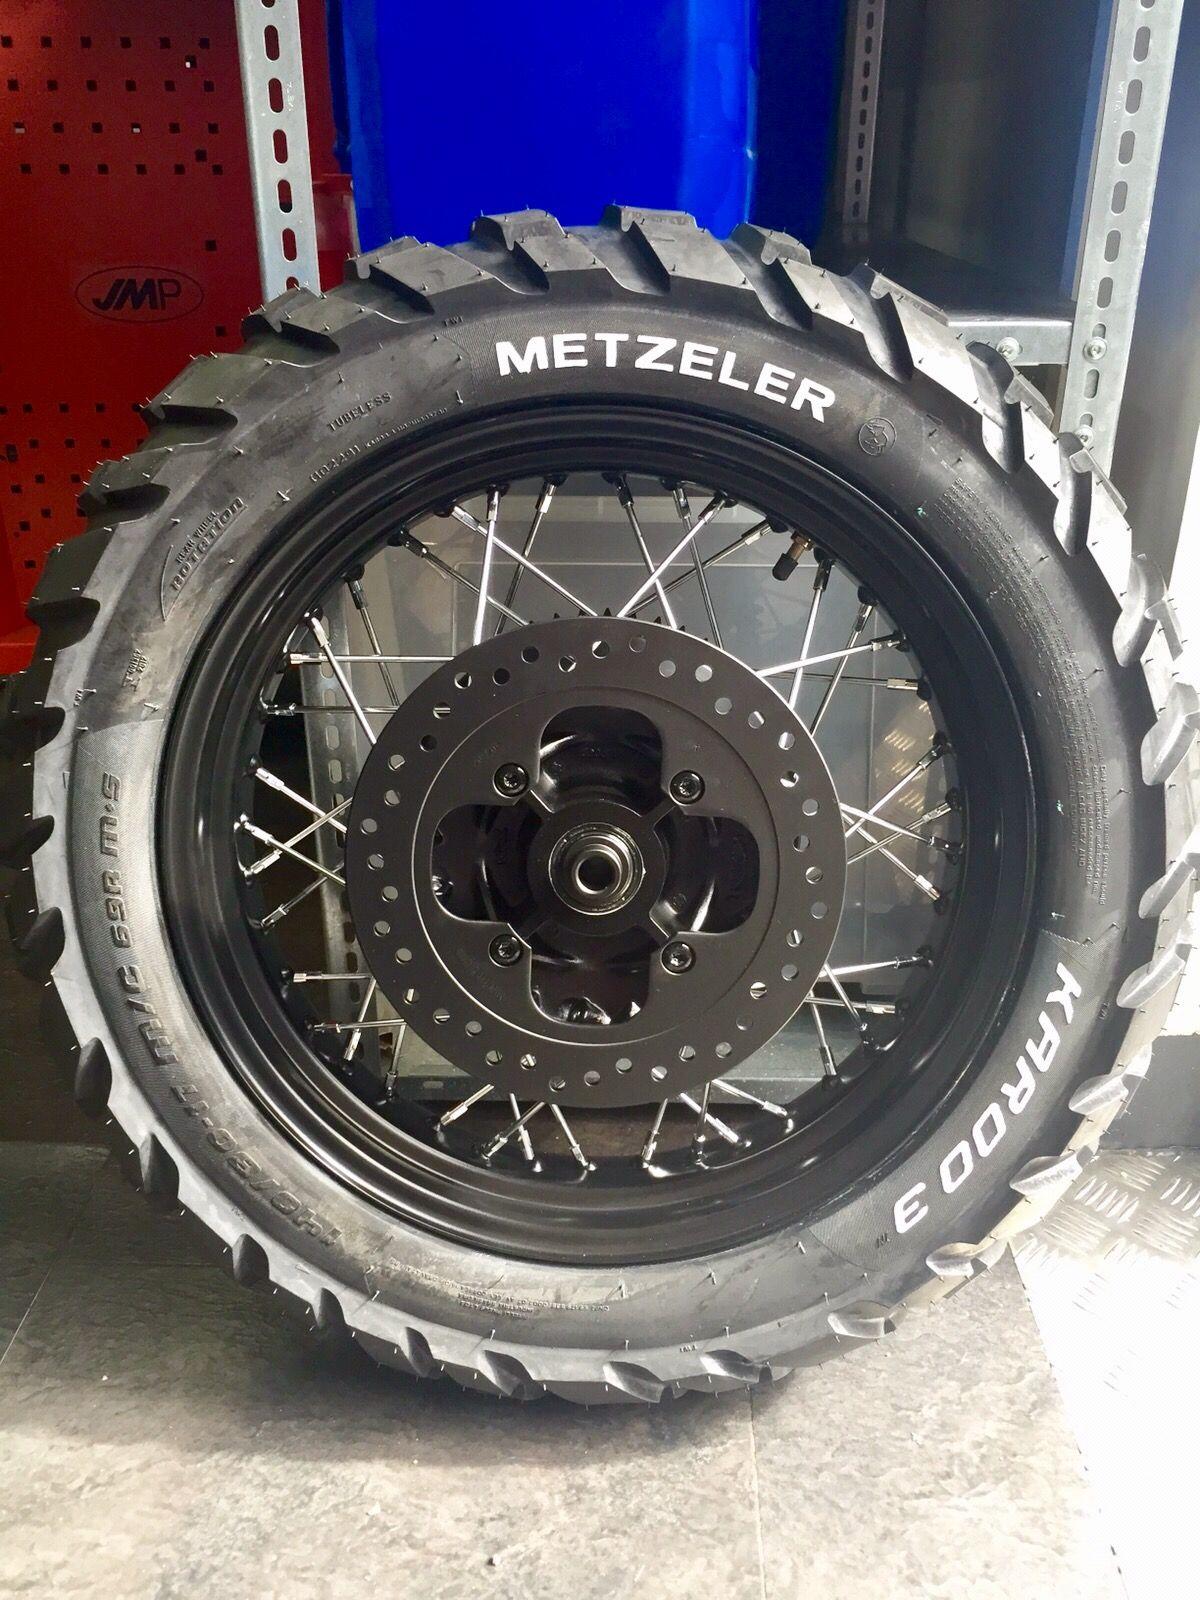 Black Brake Disc Plus Metzeler Karoo3 For Bonneville T100 Triumph Motorcycles Bonneville T100 Bonneville